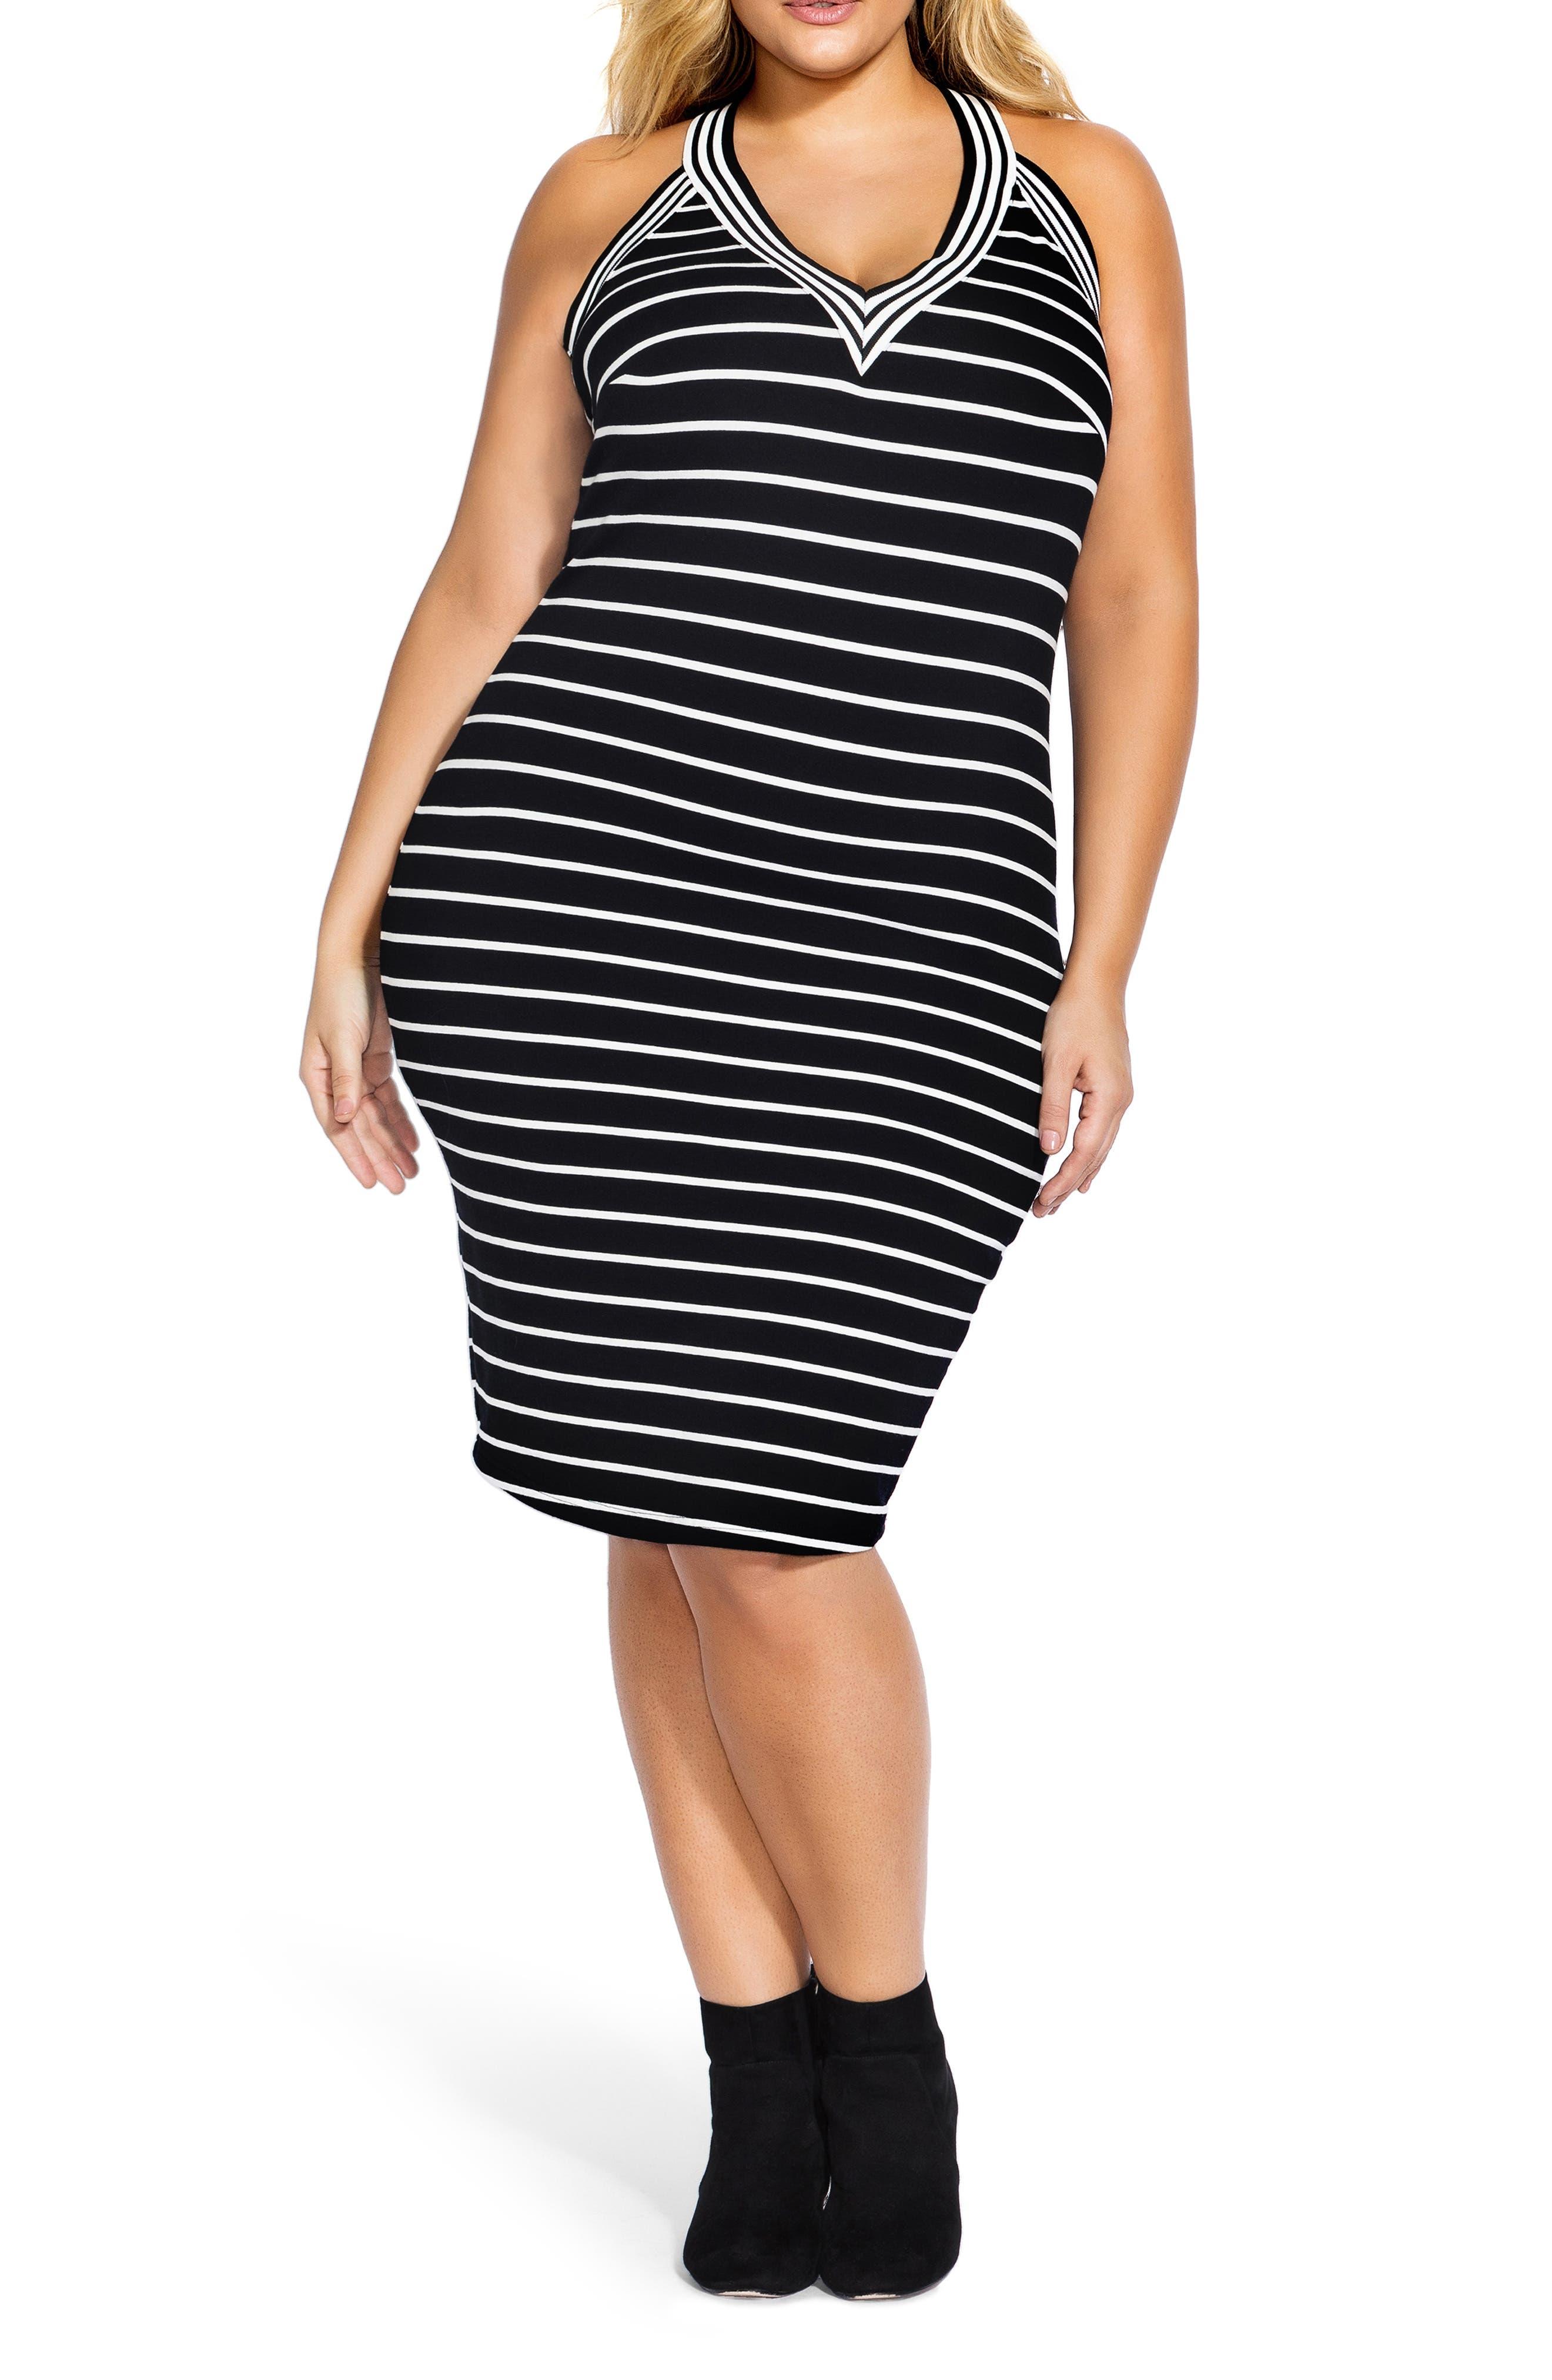 CITY CHIC Stripe Racerback Dress, Main, color, WHITE STRIPE